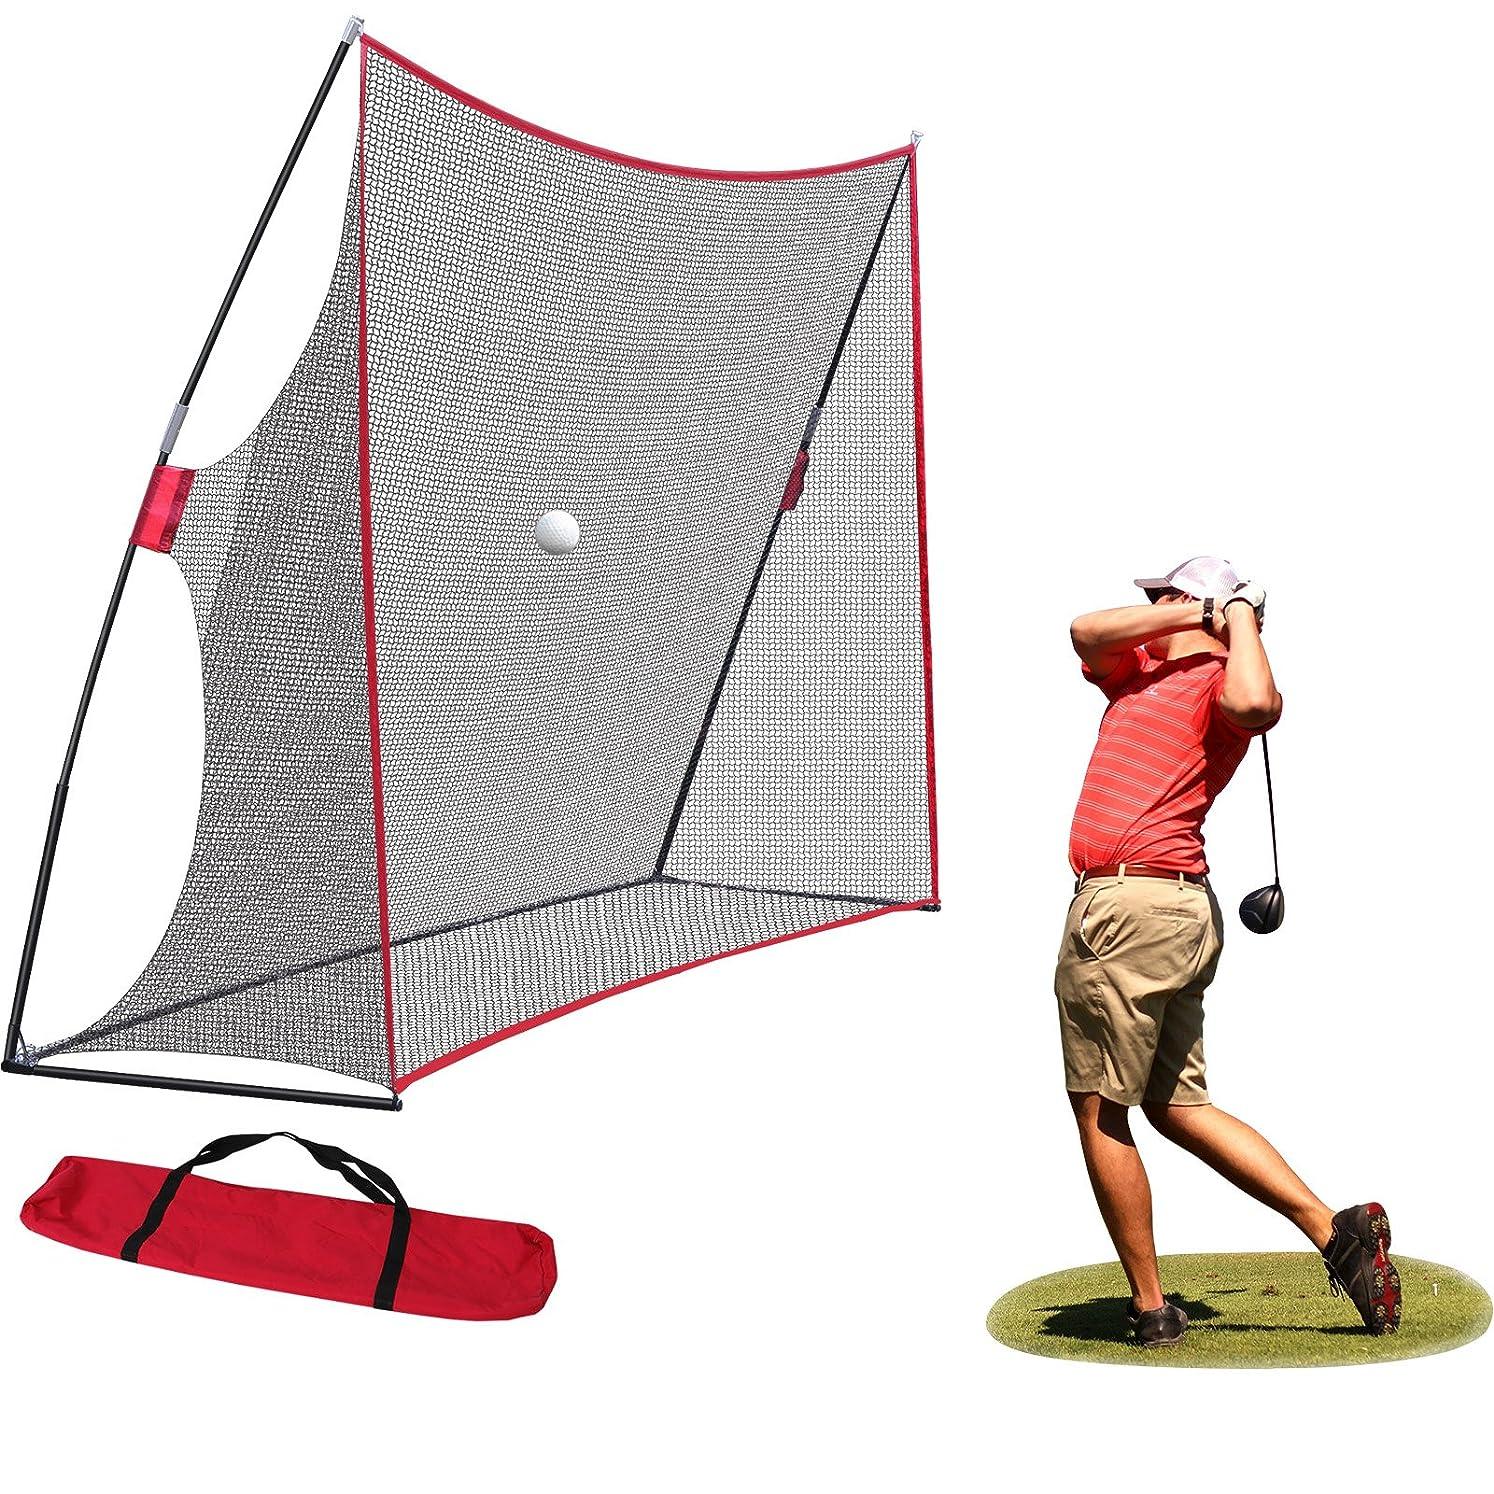 Nova Microdermabrasion Large 10x7ft Portable Golf Net Hitting Net Practice Driving Indoor Outdoor w/Carry Bag kfhzamqvt1400513